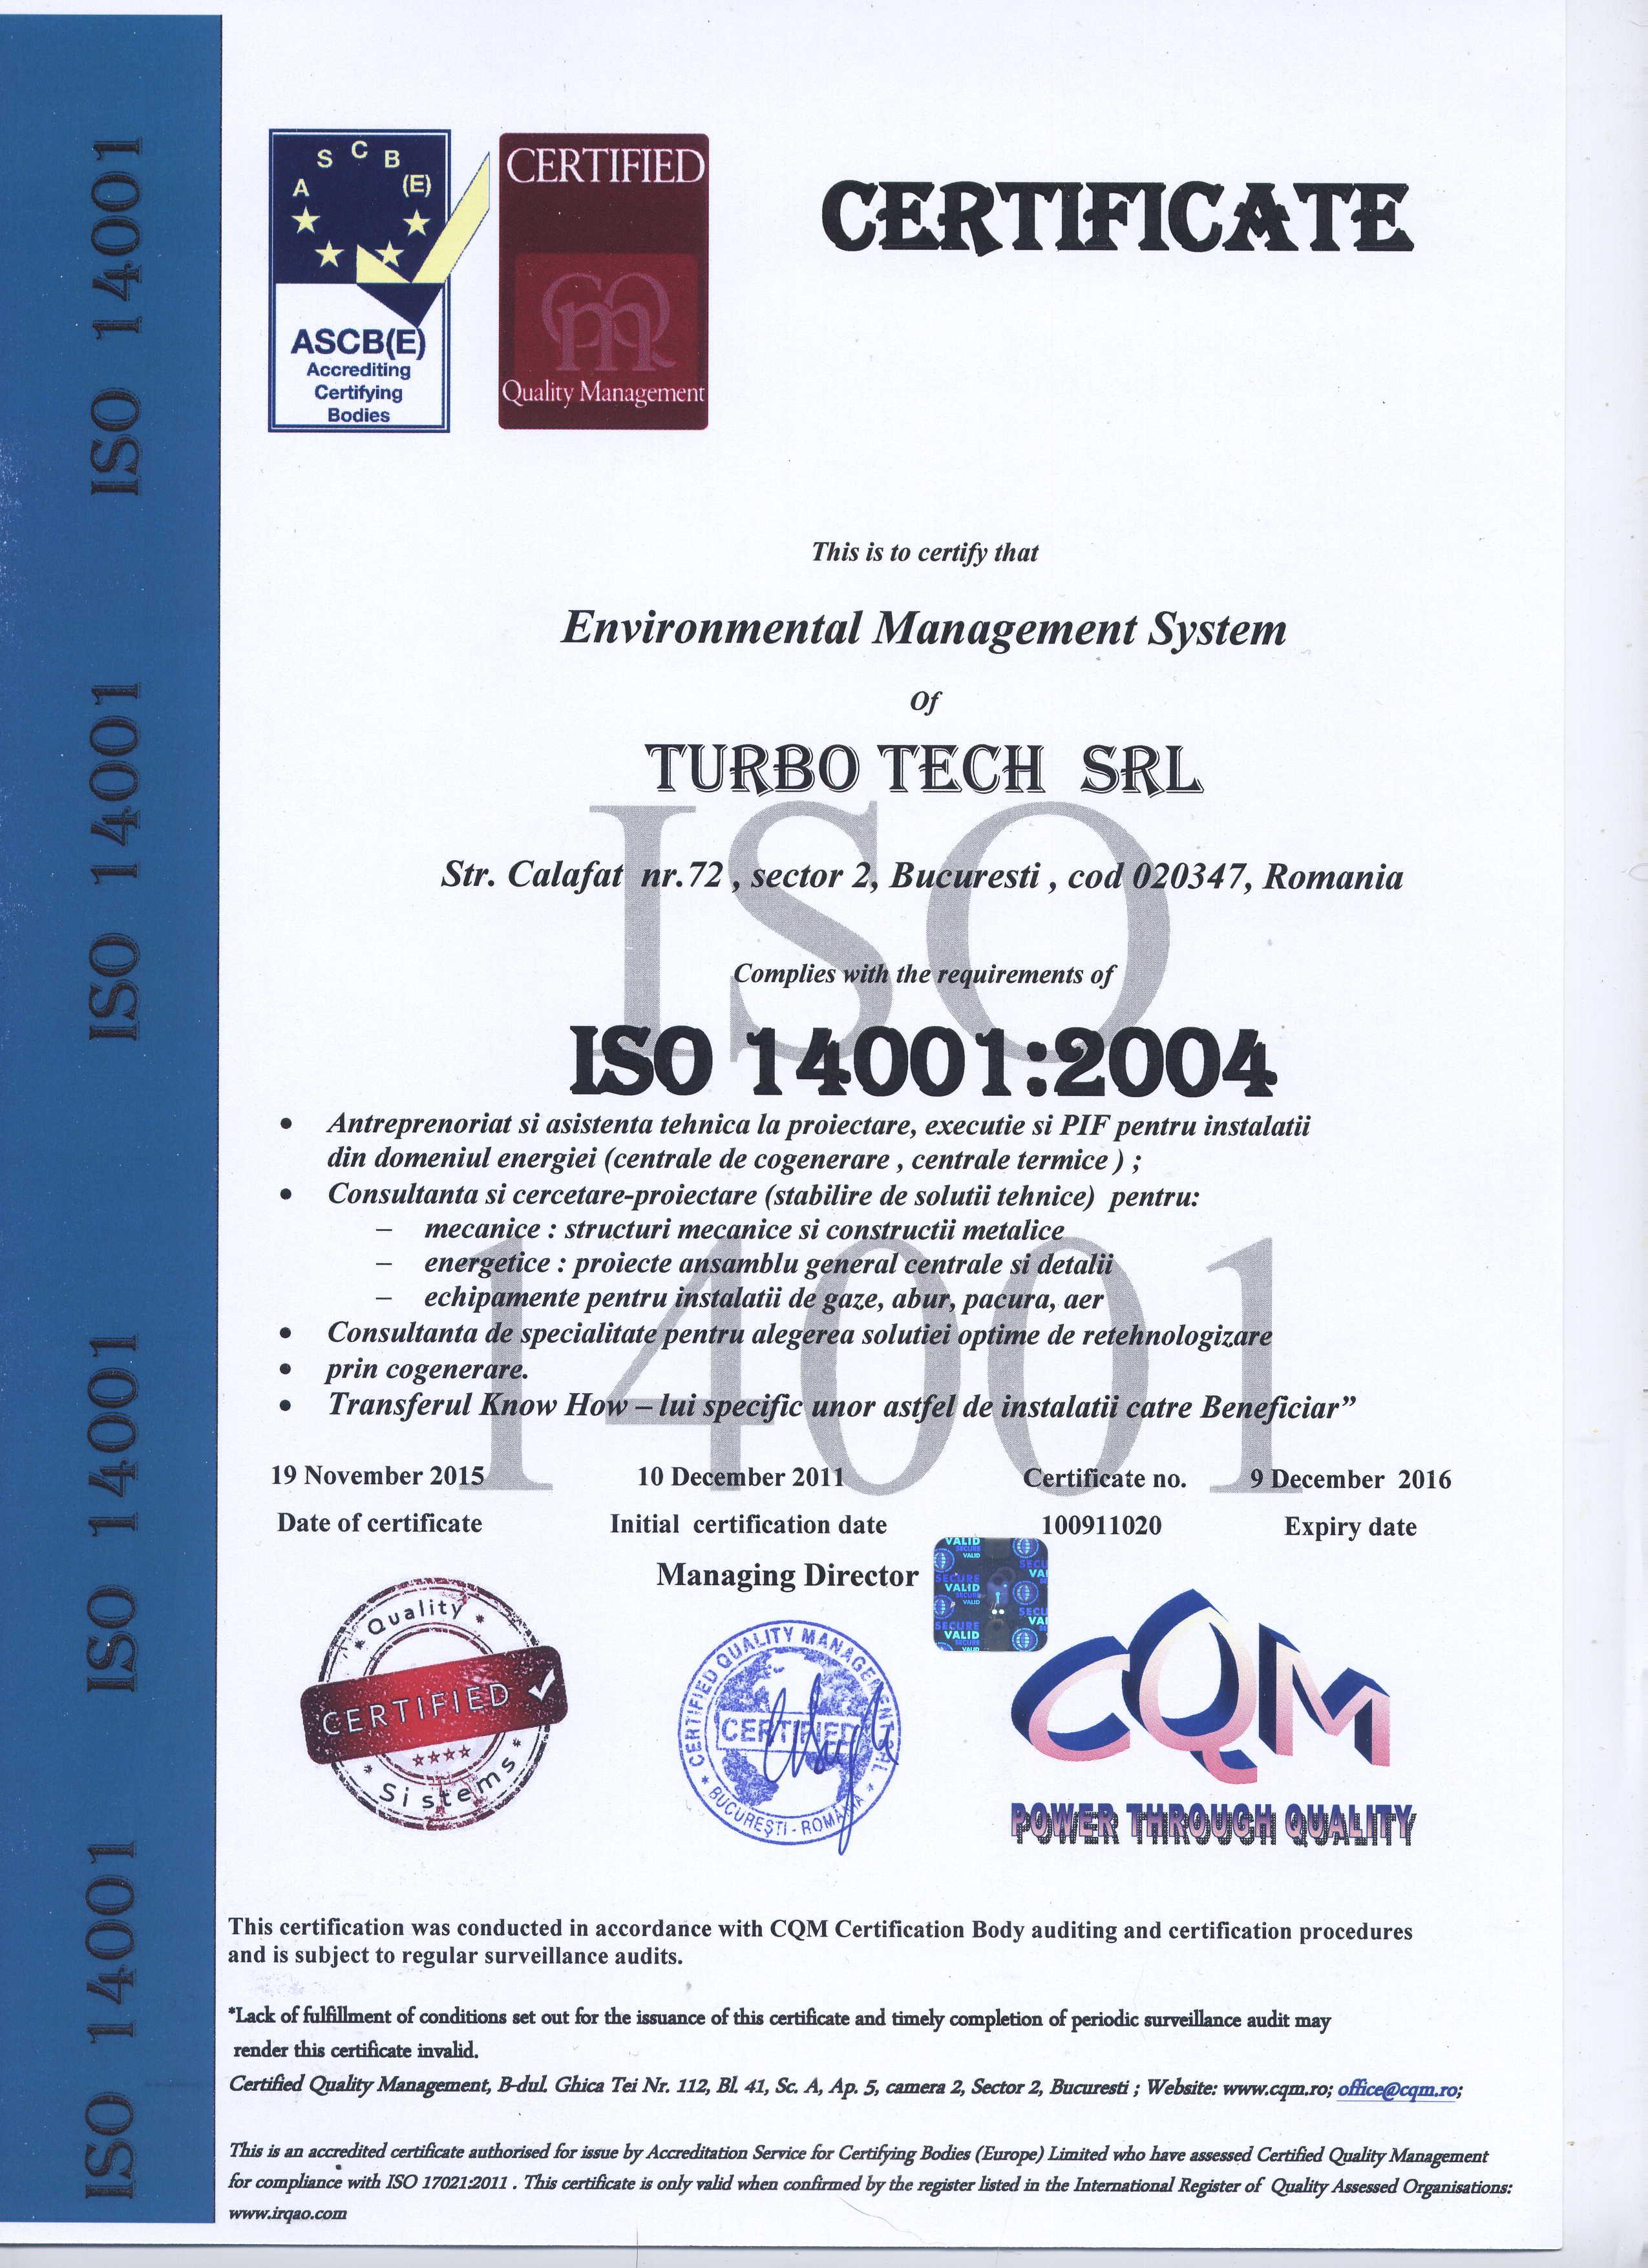 Accreditation Turbo Tech Ltd